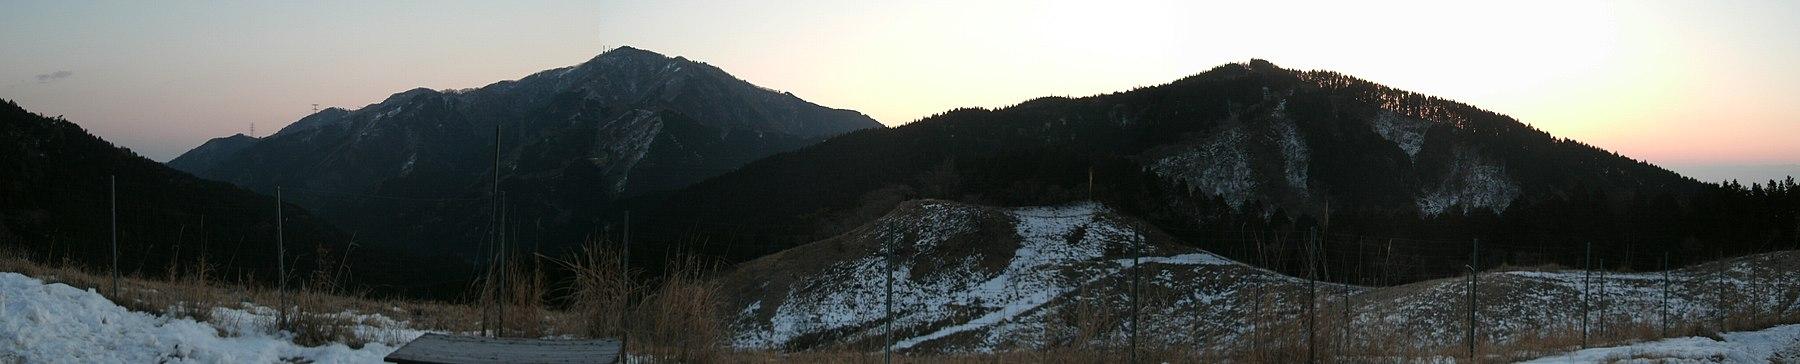 Tannzawa 丹沢 ootama 大山 - panoramio.jpg